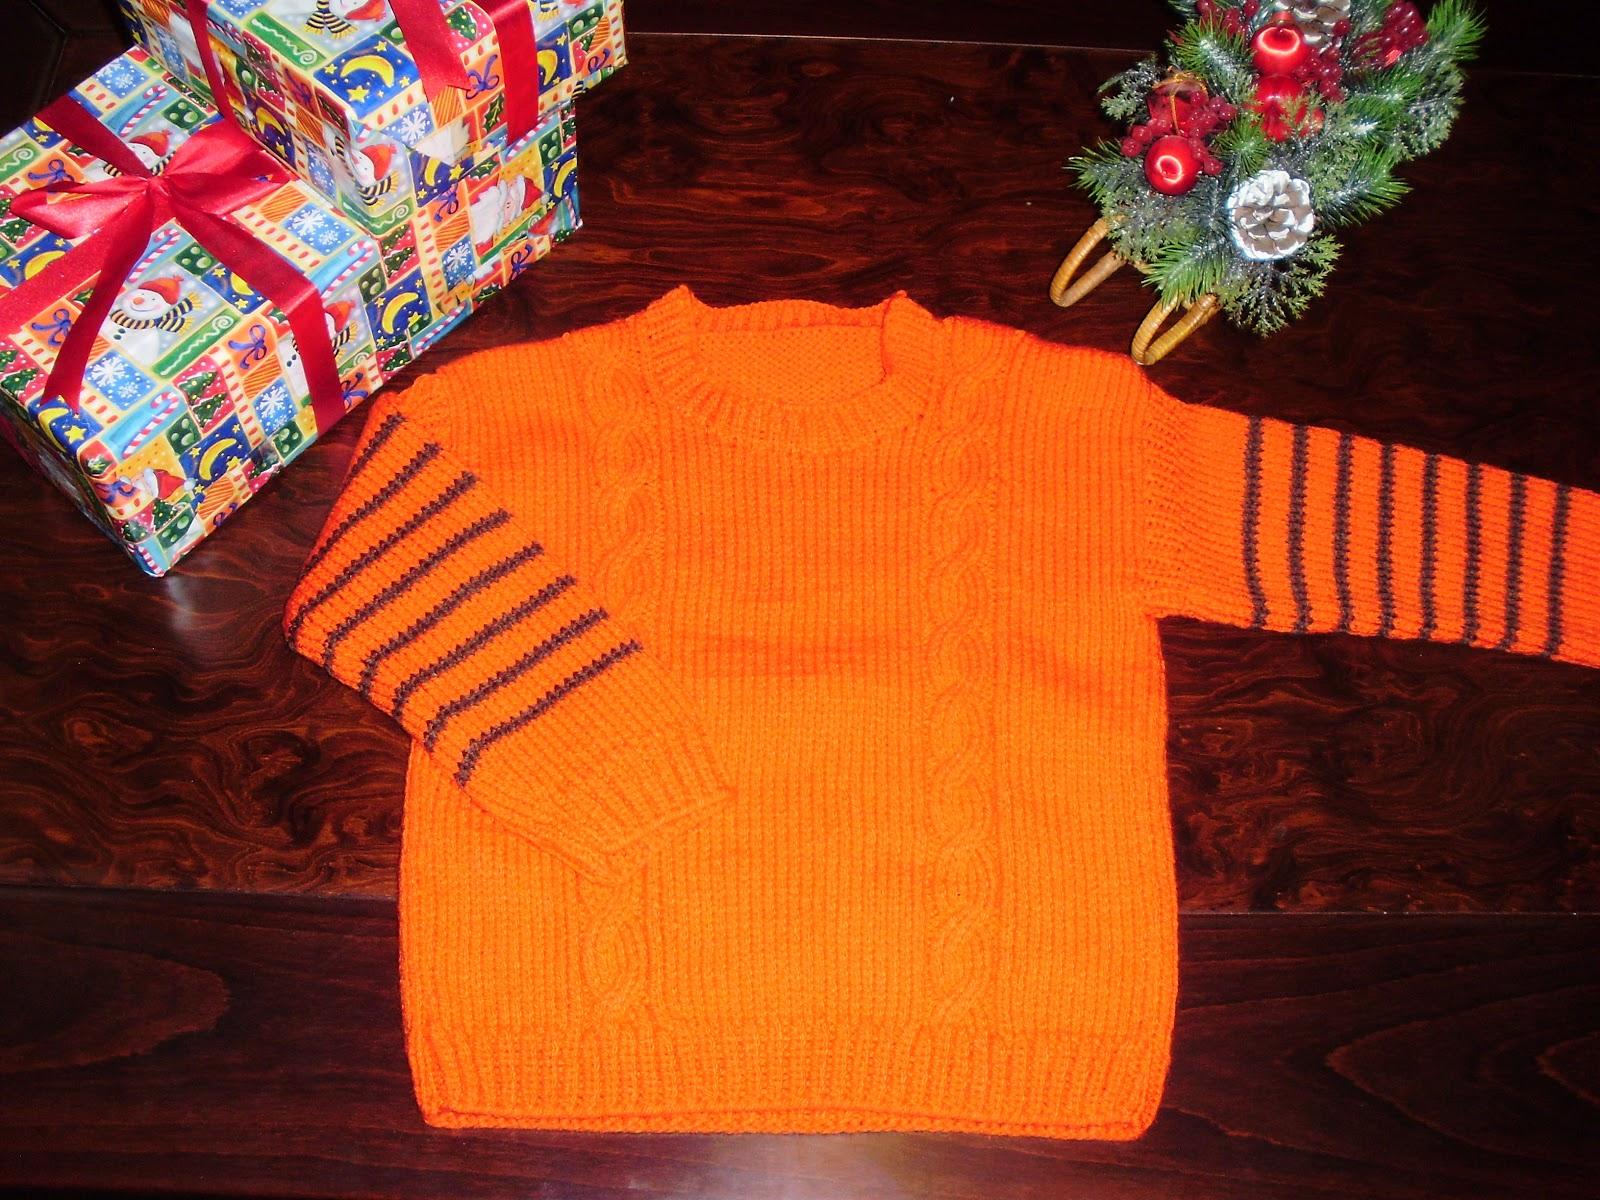 770ece7a11e Παιδικό πλεκτό πουλόβερ για κορίτσια. Συλλογή